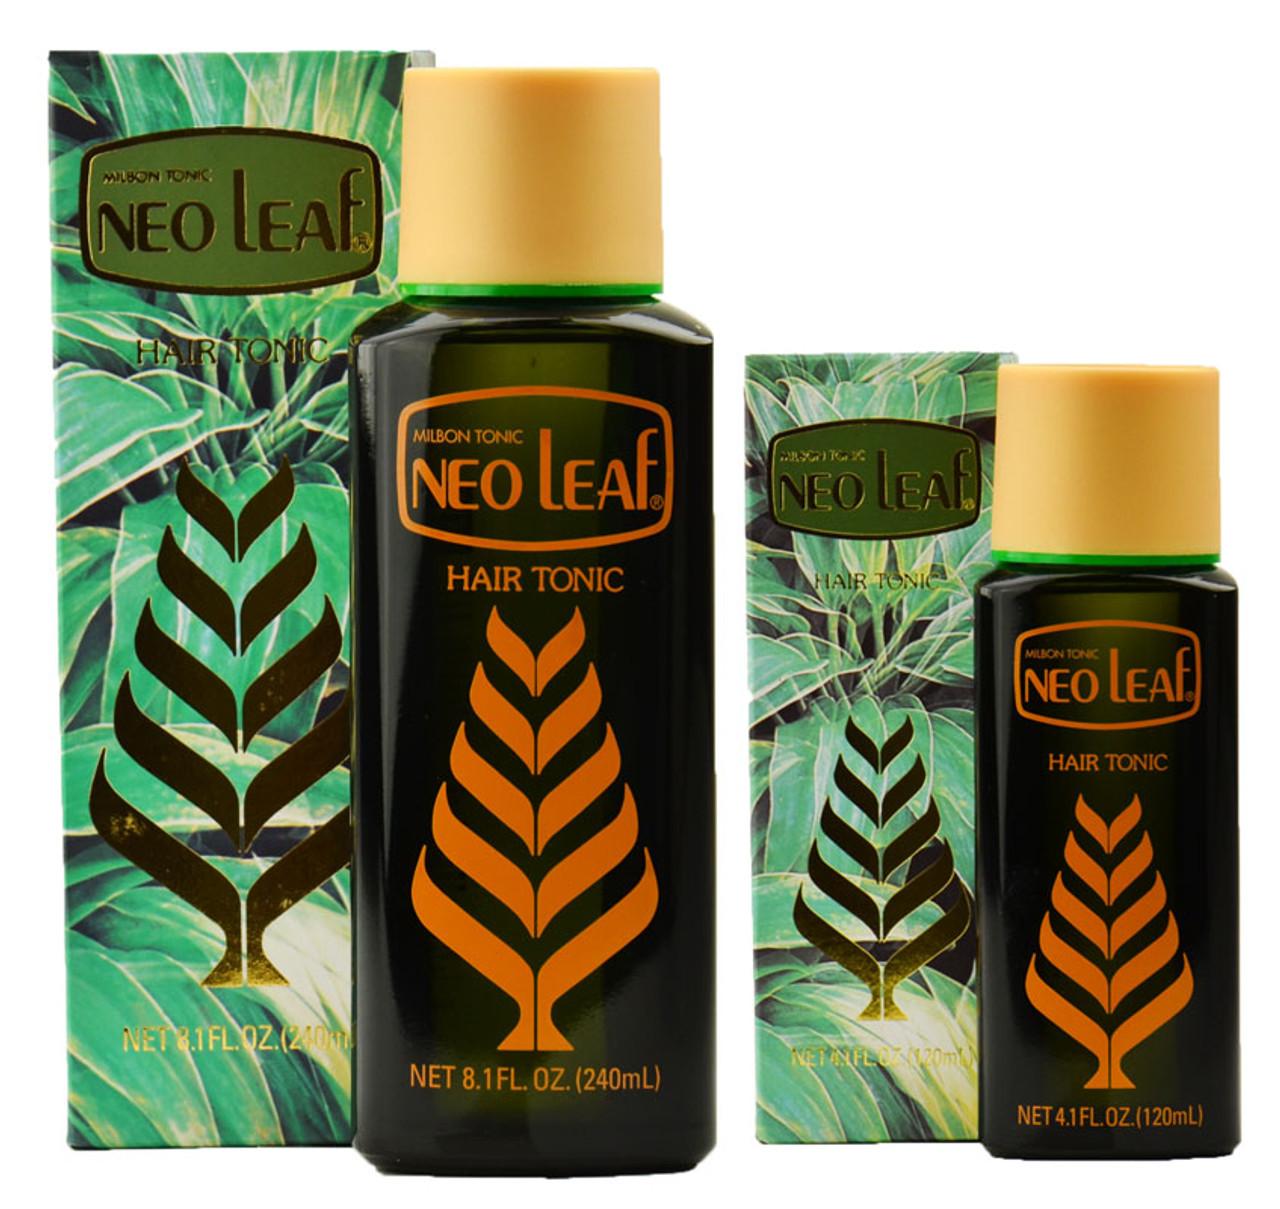 Milbon Tonic Neo Leaf Hair Tonic